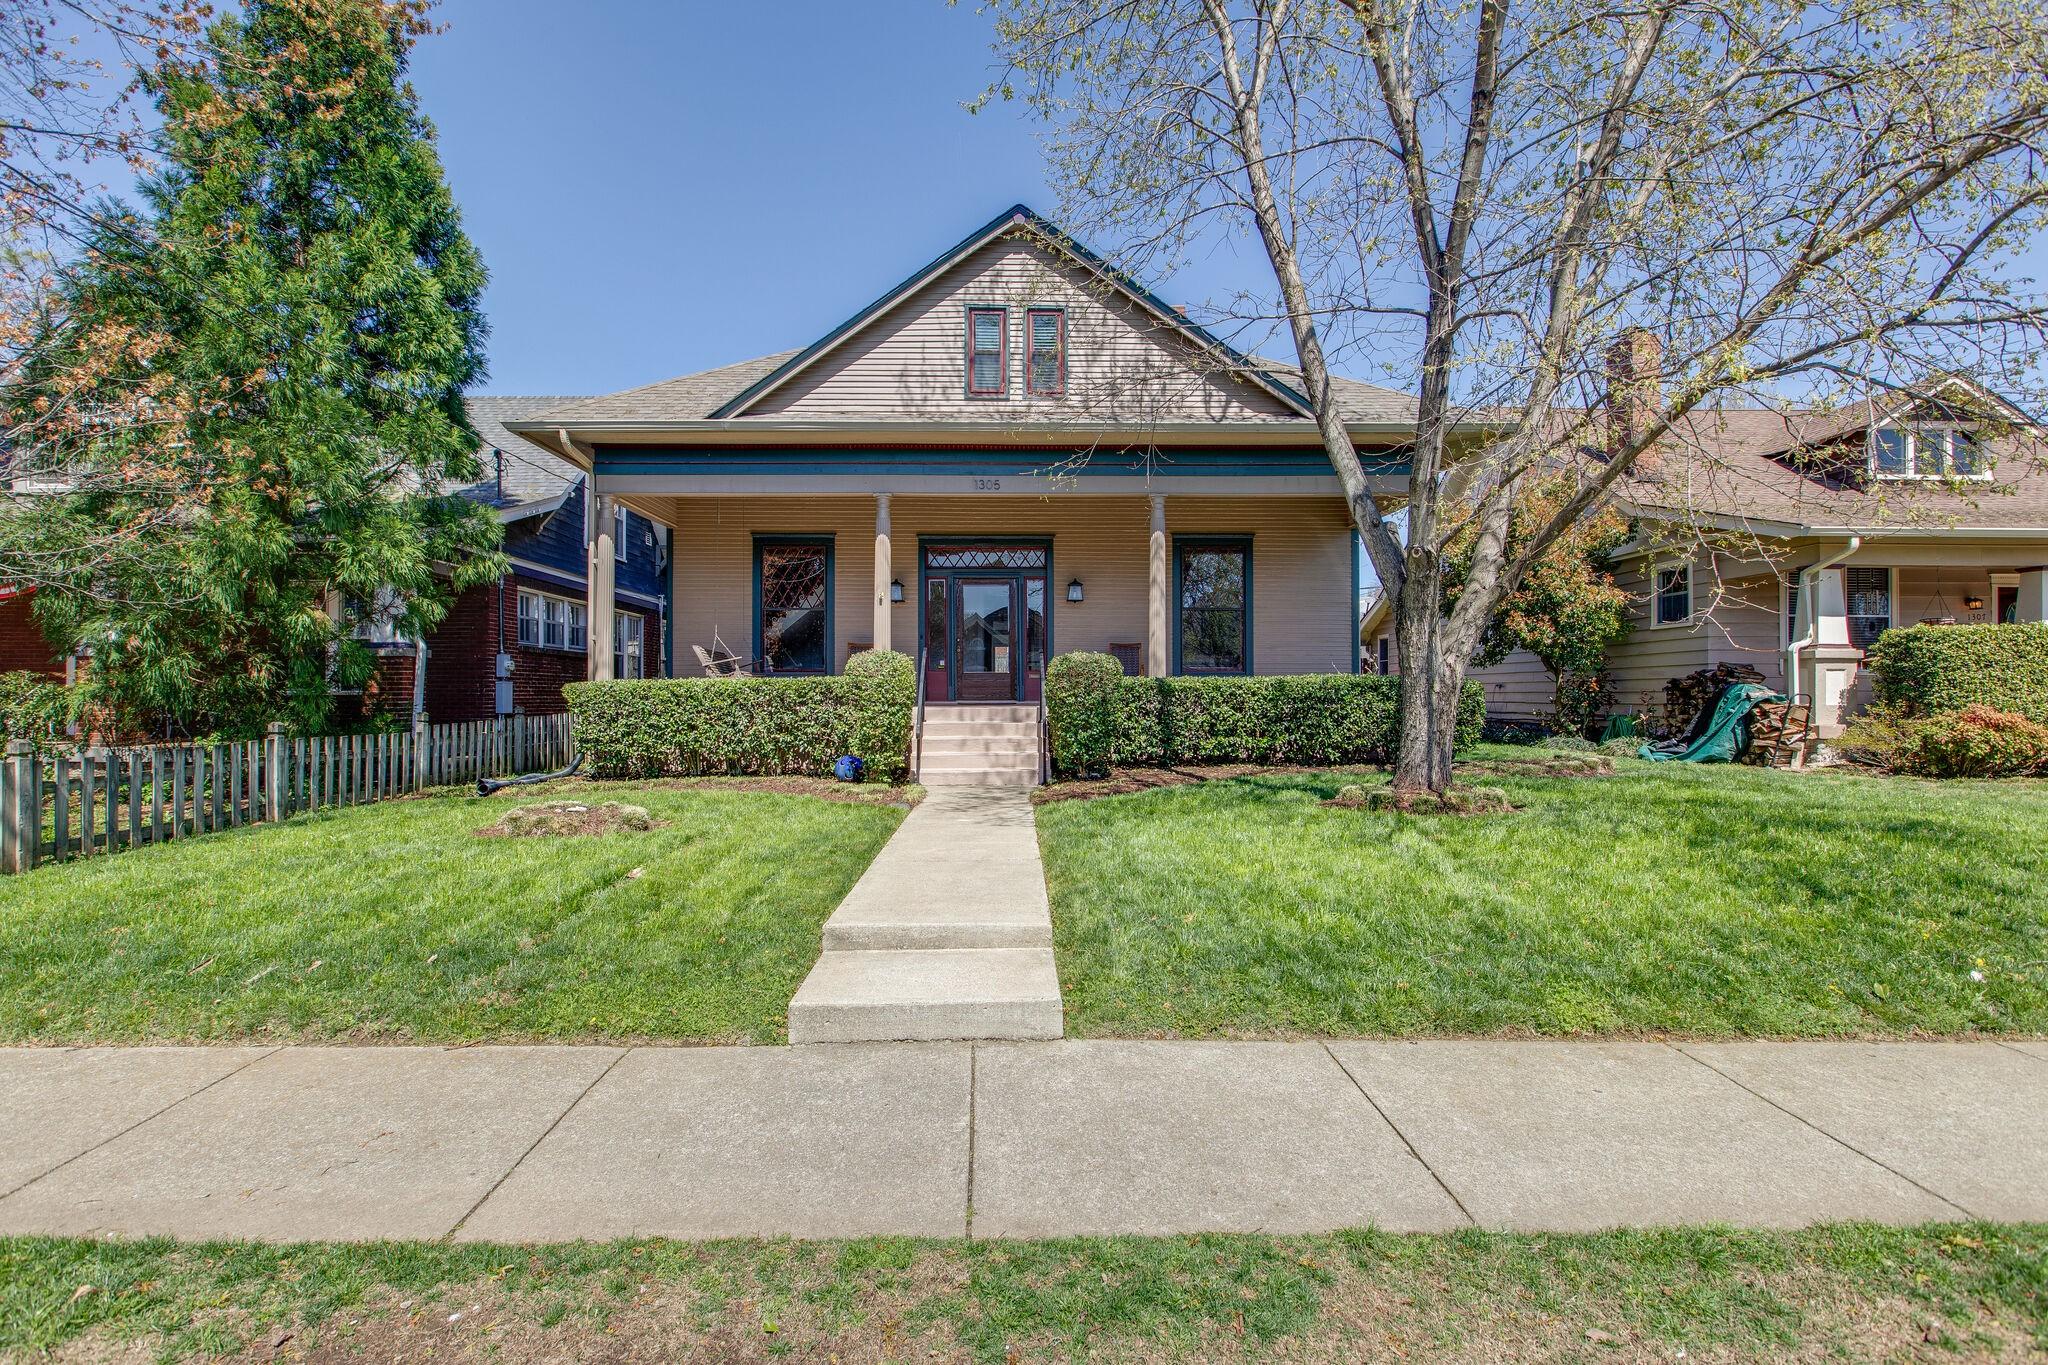 1305 Gartland Ave Property Photo - Nashville, TN real estate listing